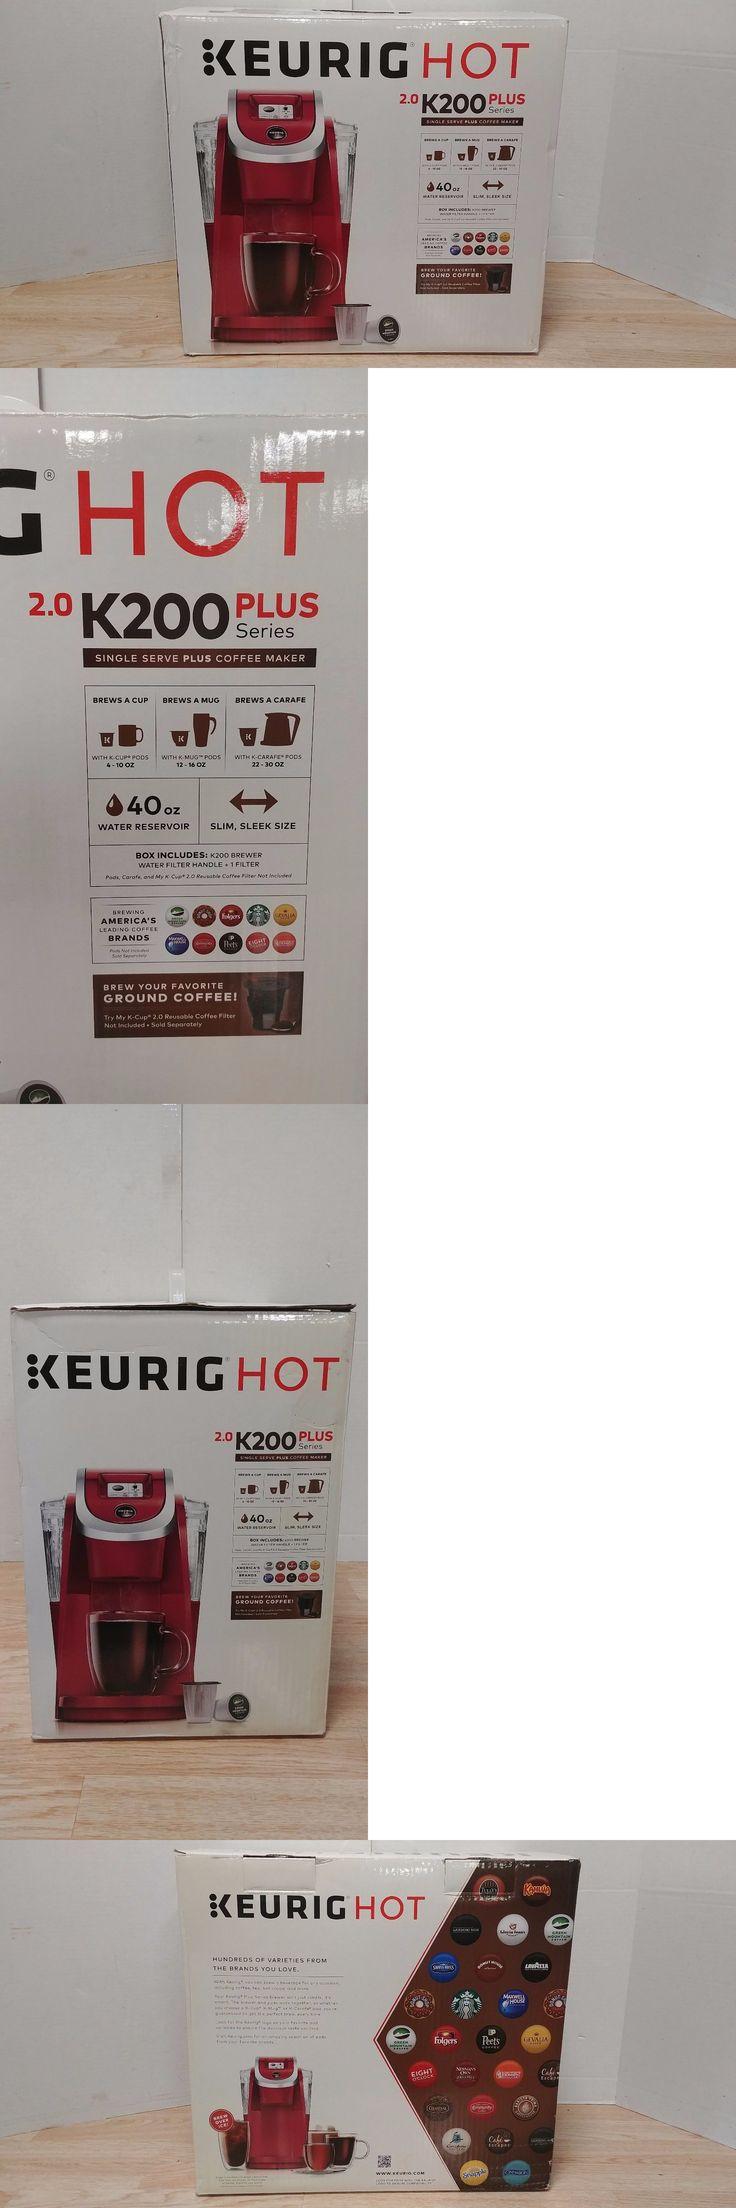 Single Serve Brewers 156775: Keurig Hot 2.0 K200 Plus Series Single Serve Coffee Maker Brewer -> BUY IT NOW ONLY: $84.99 on eBay!